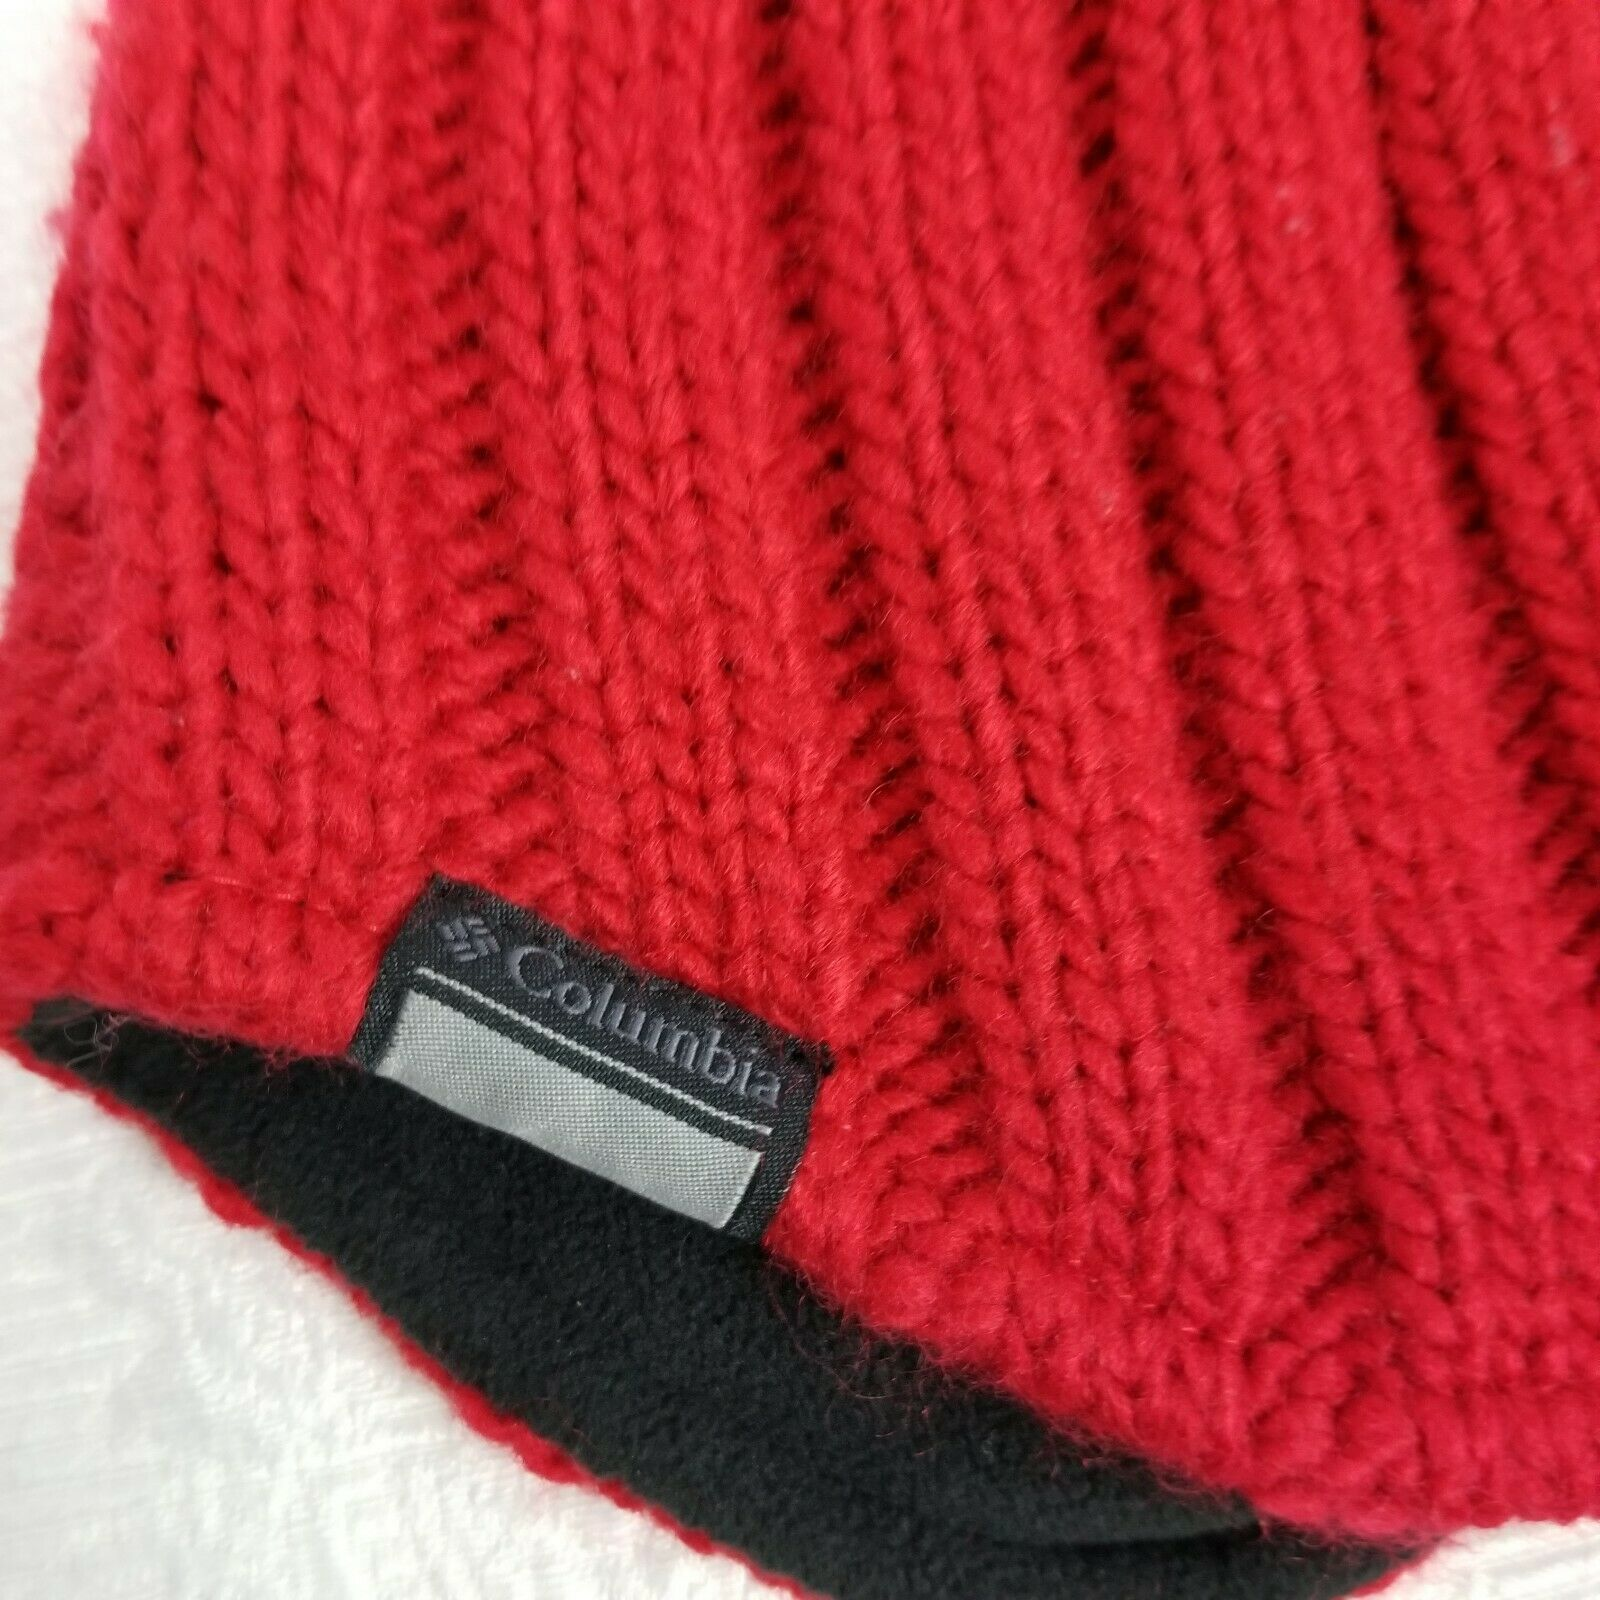 Columbia Red Knit Beanie Winter Hat Men's Women's One Size OS Unisex Fleece Line